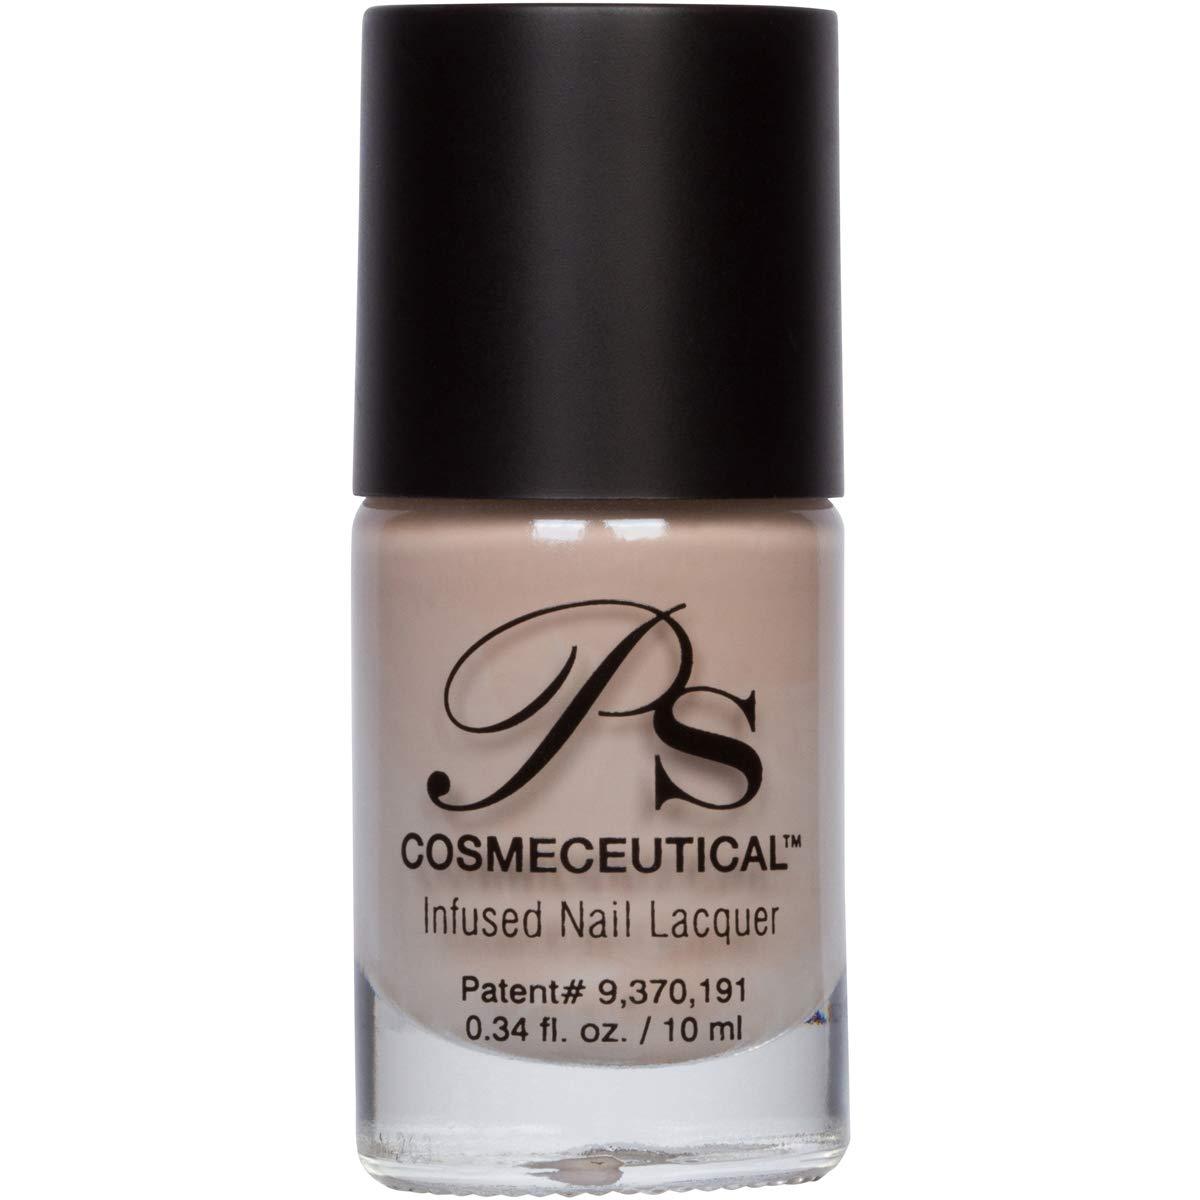 PS Polish All Natural Anti-fungal Nail Polish, Safe Non-Toxic Professional Grade Nail Art and Polish Nail Lacquer, Best Nail Polishes for Manicure, Pedicure, Hands, Feet and Nails (Southern Sand)